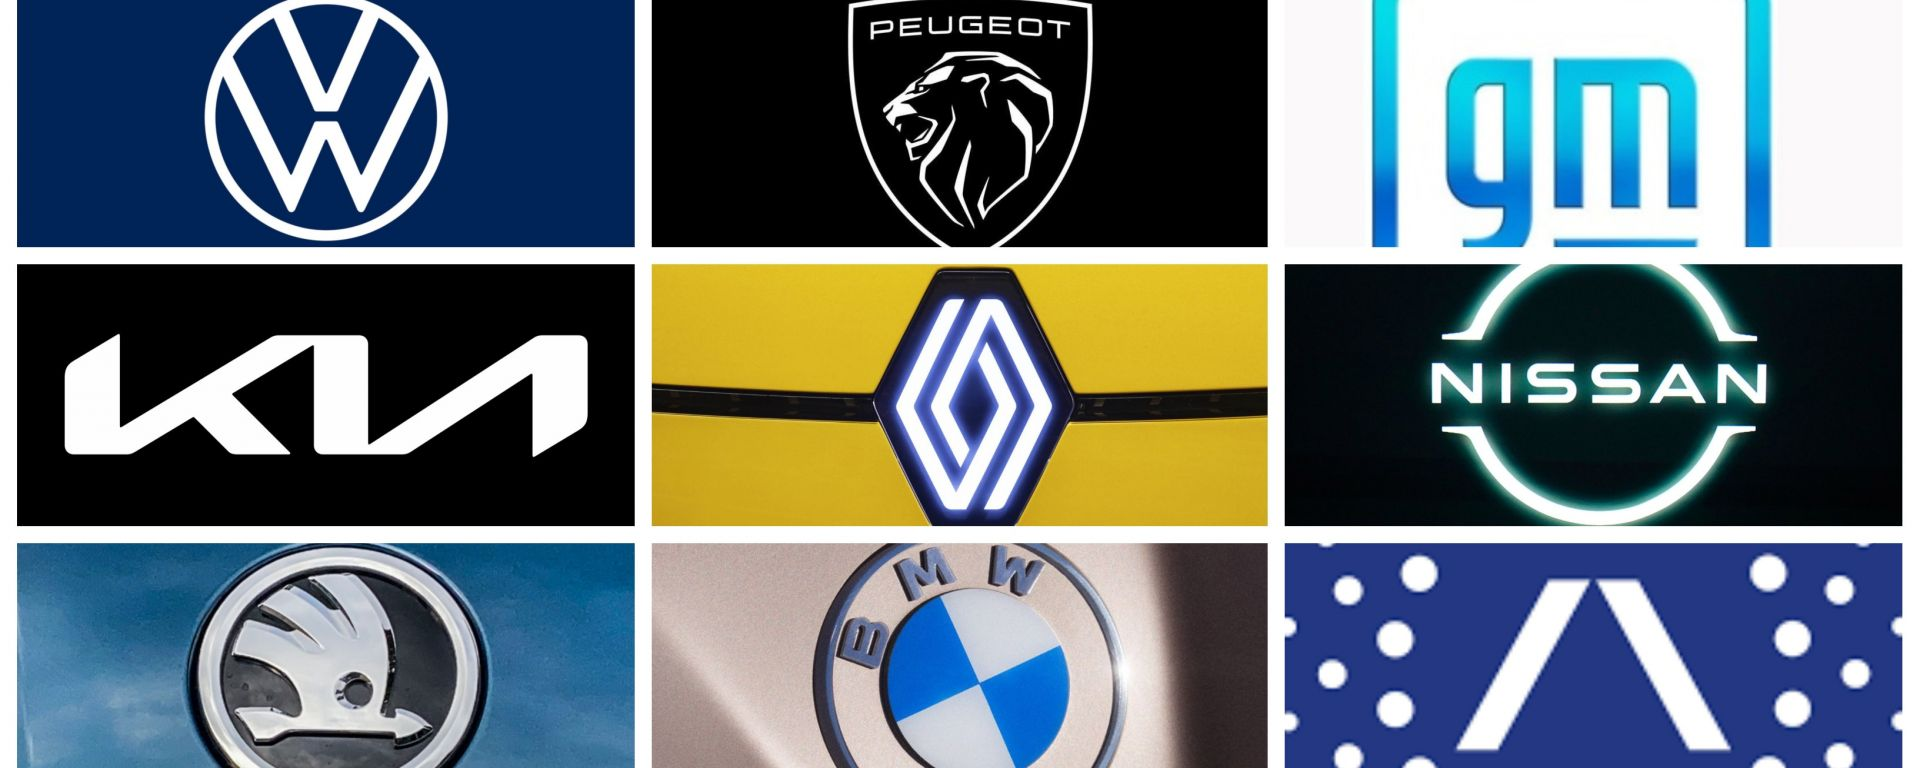 2021, è badge rivoluzione